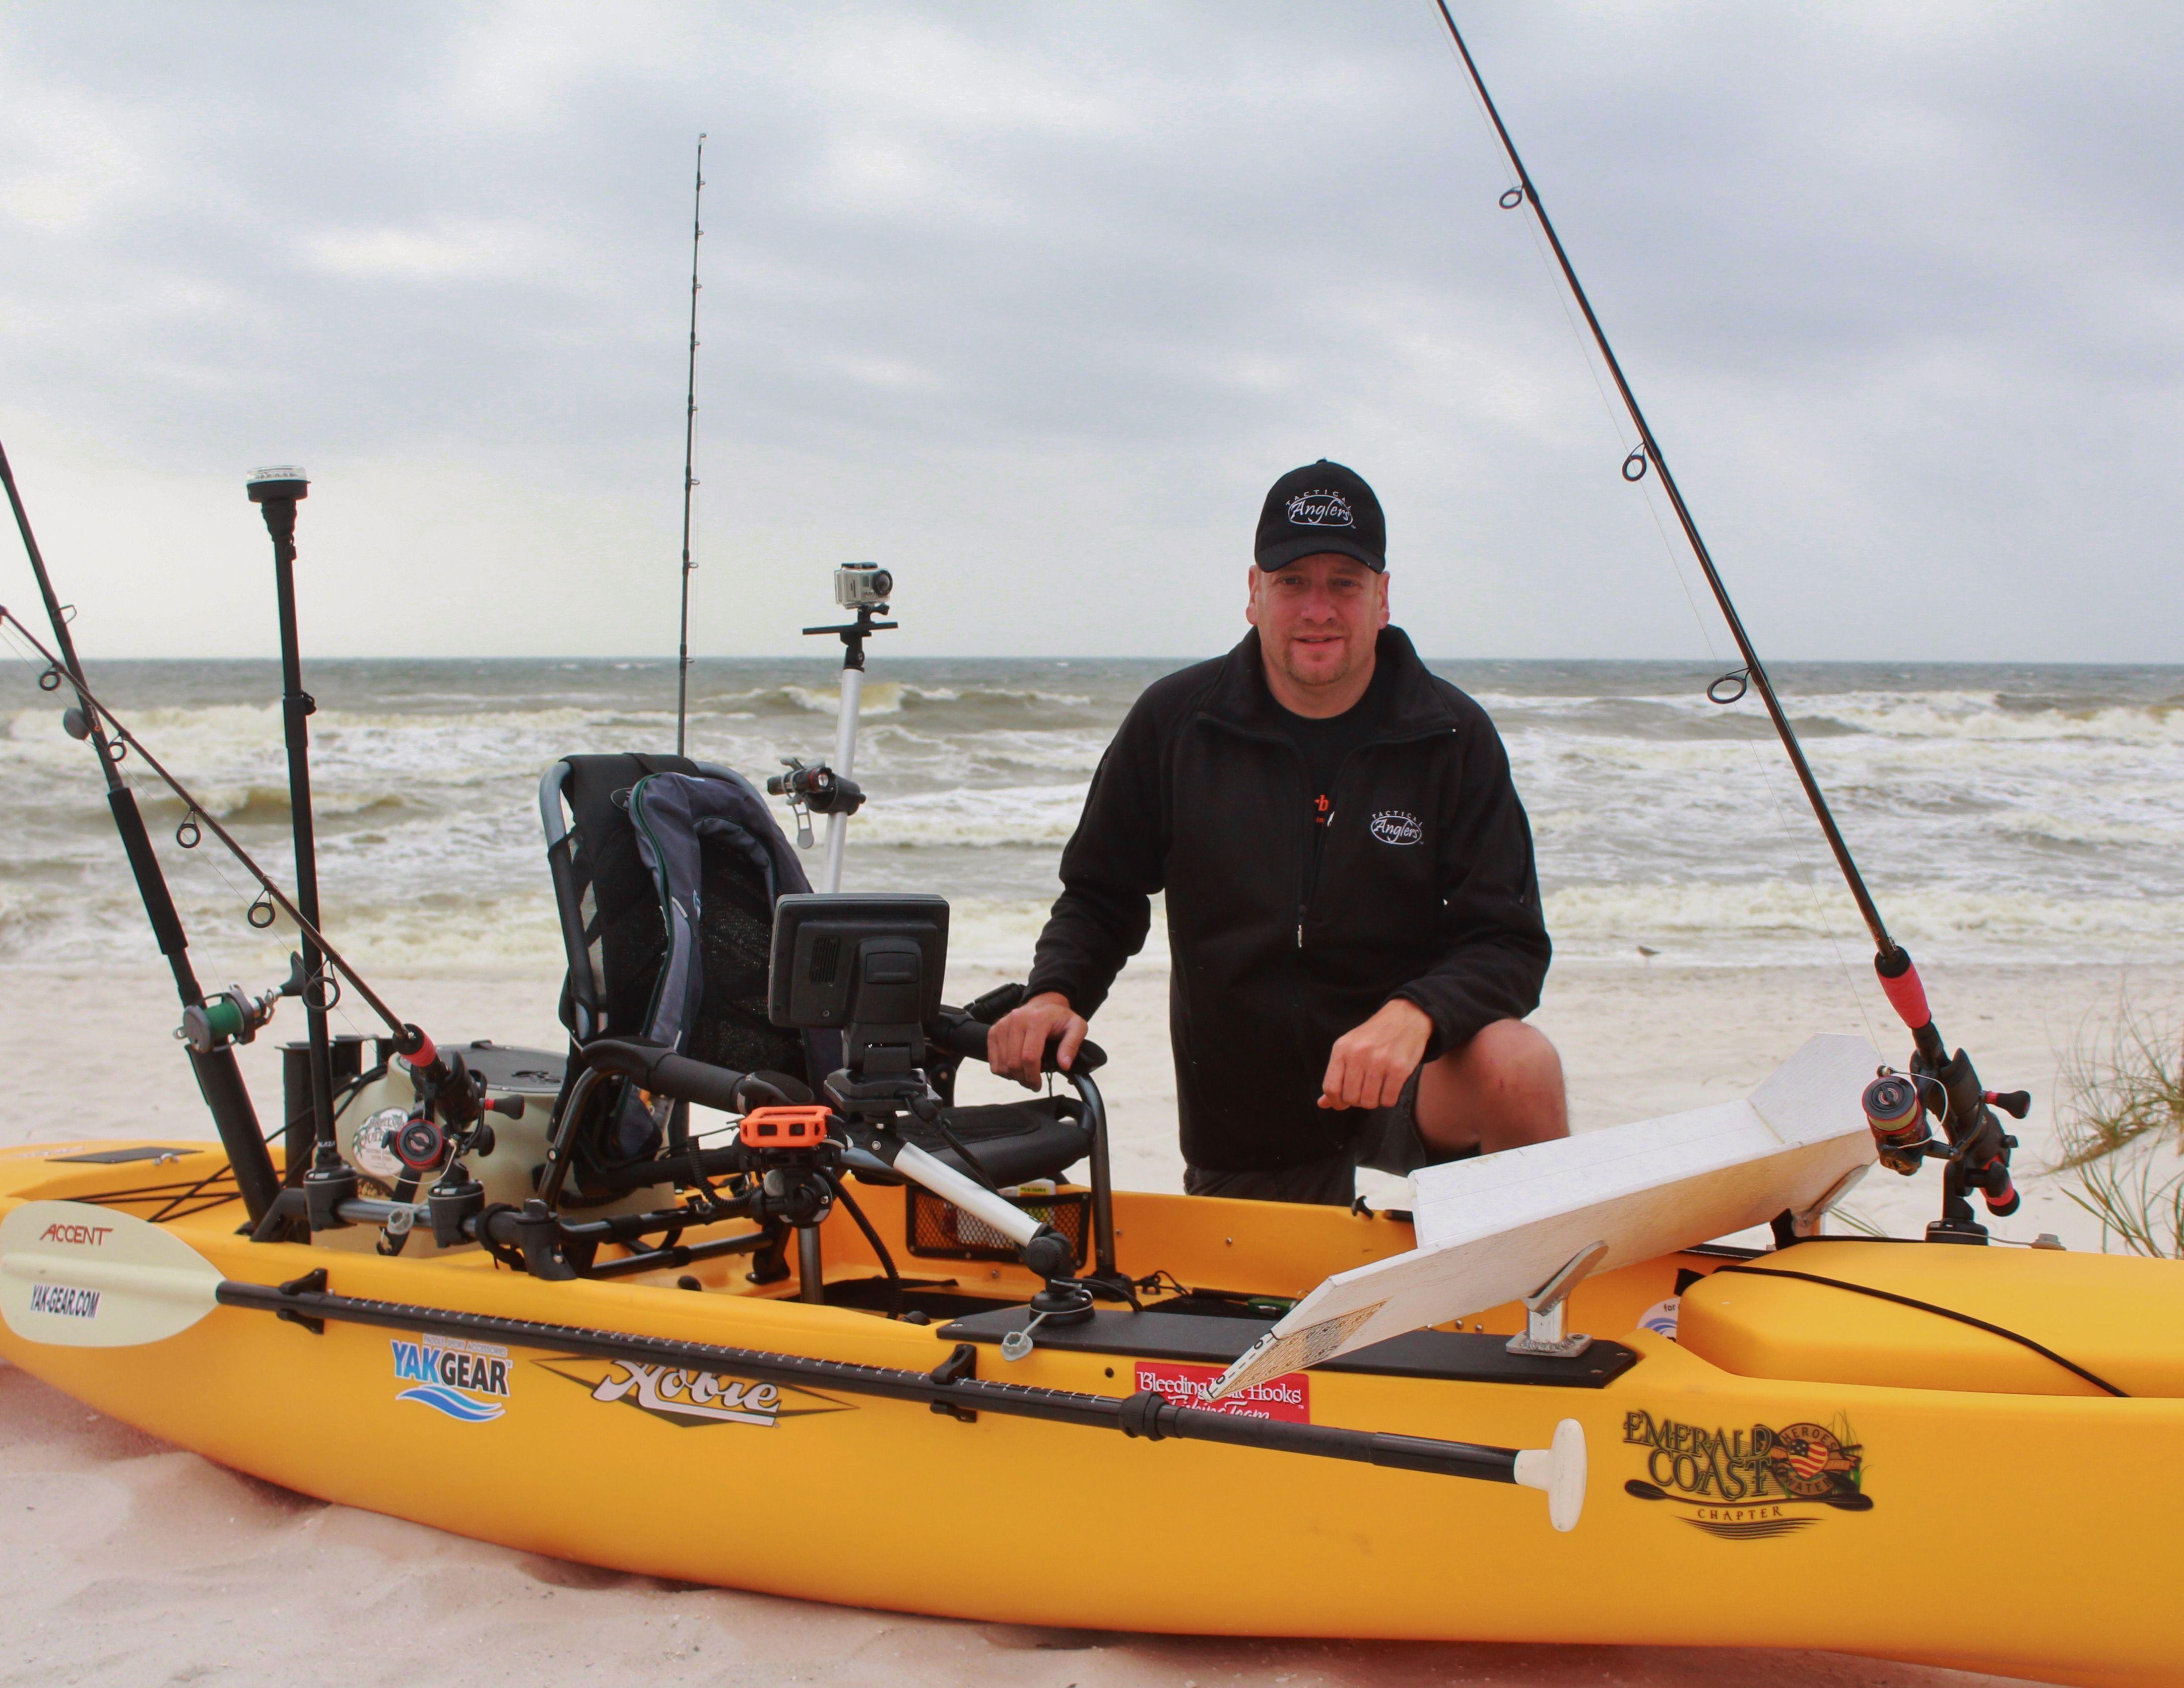 Barrett Rigged His Hobie Kayak With Yak Gear And Railblaza